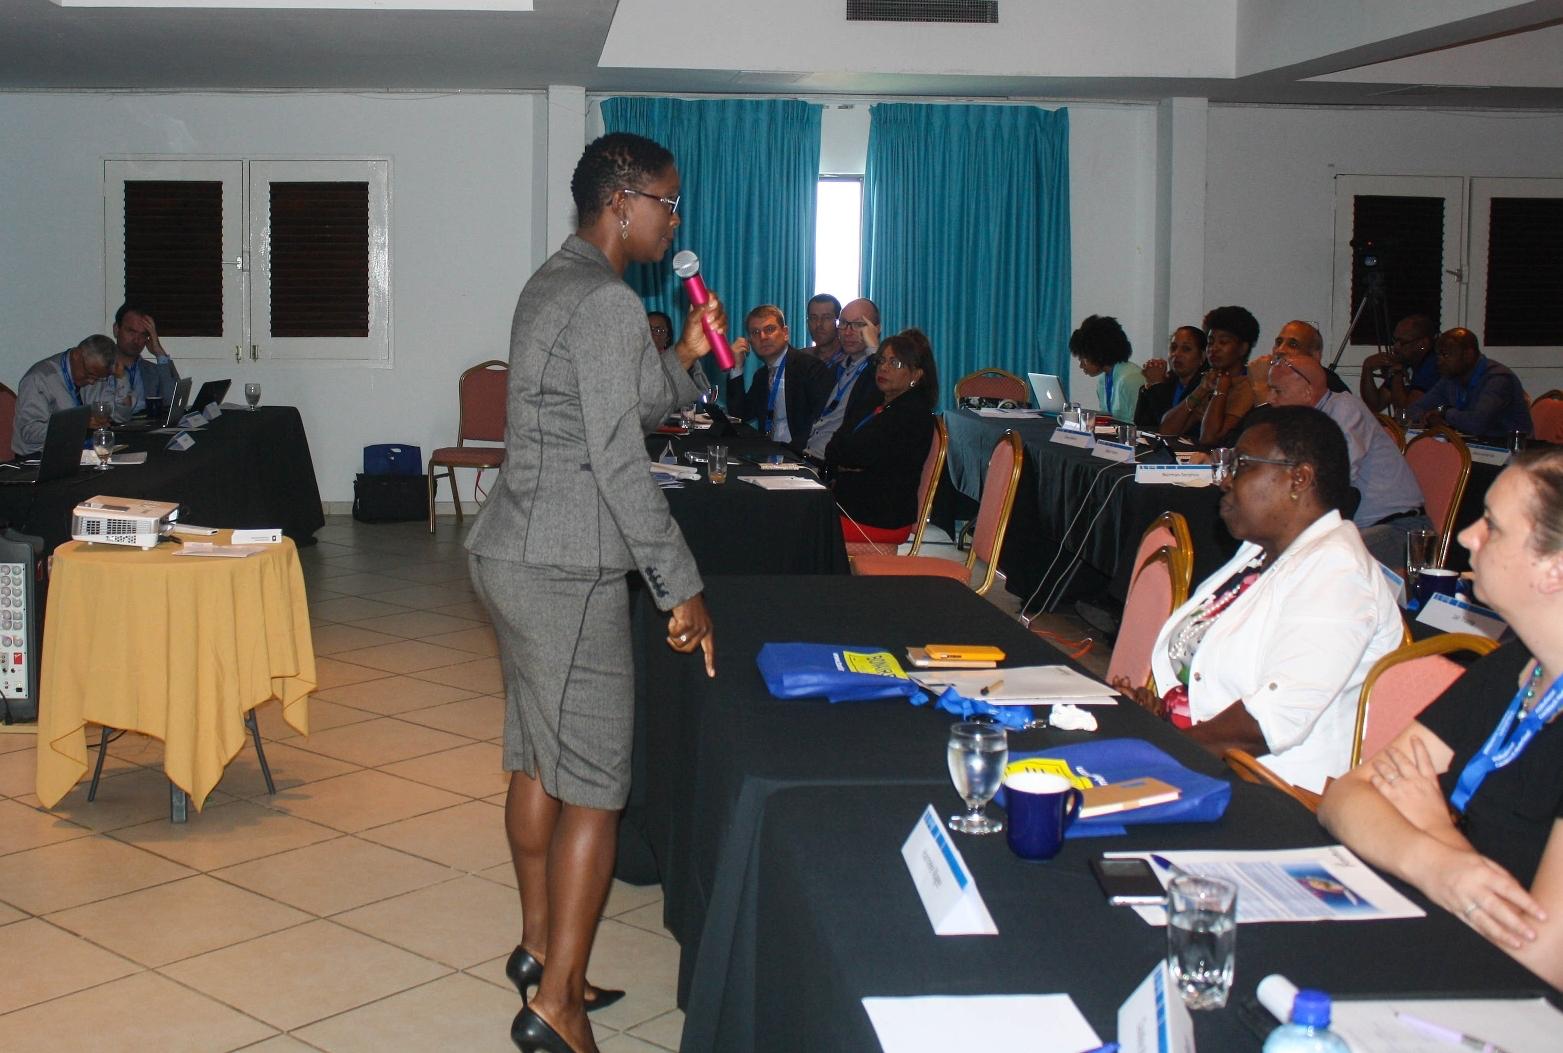 Conferentie communicatie